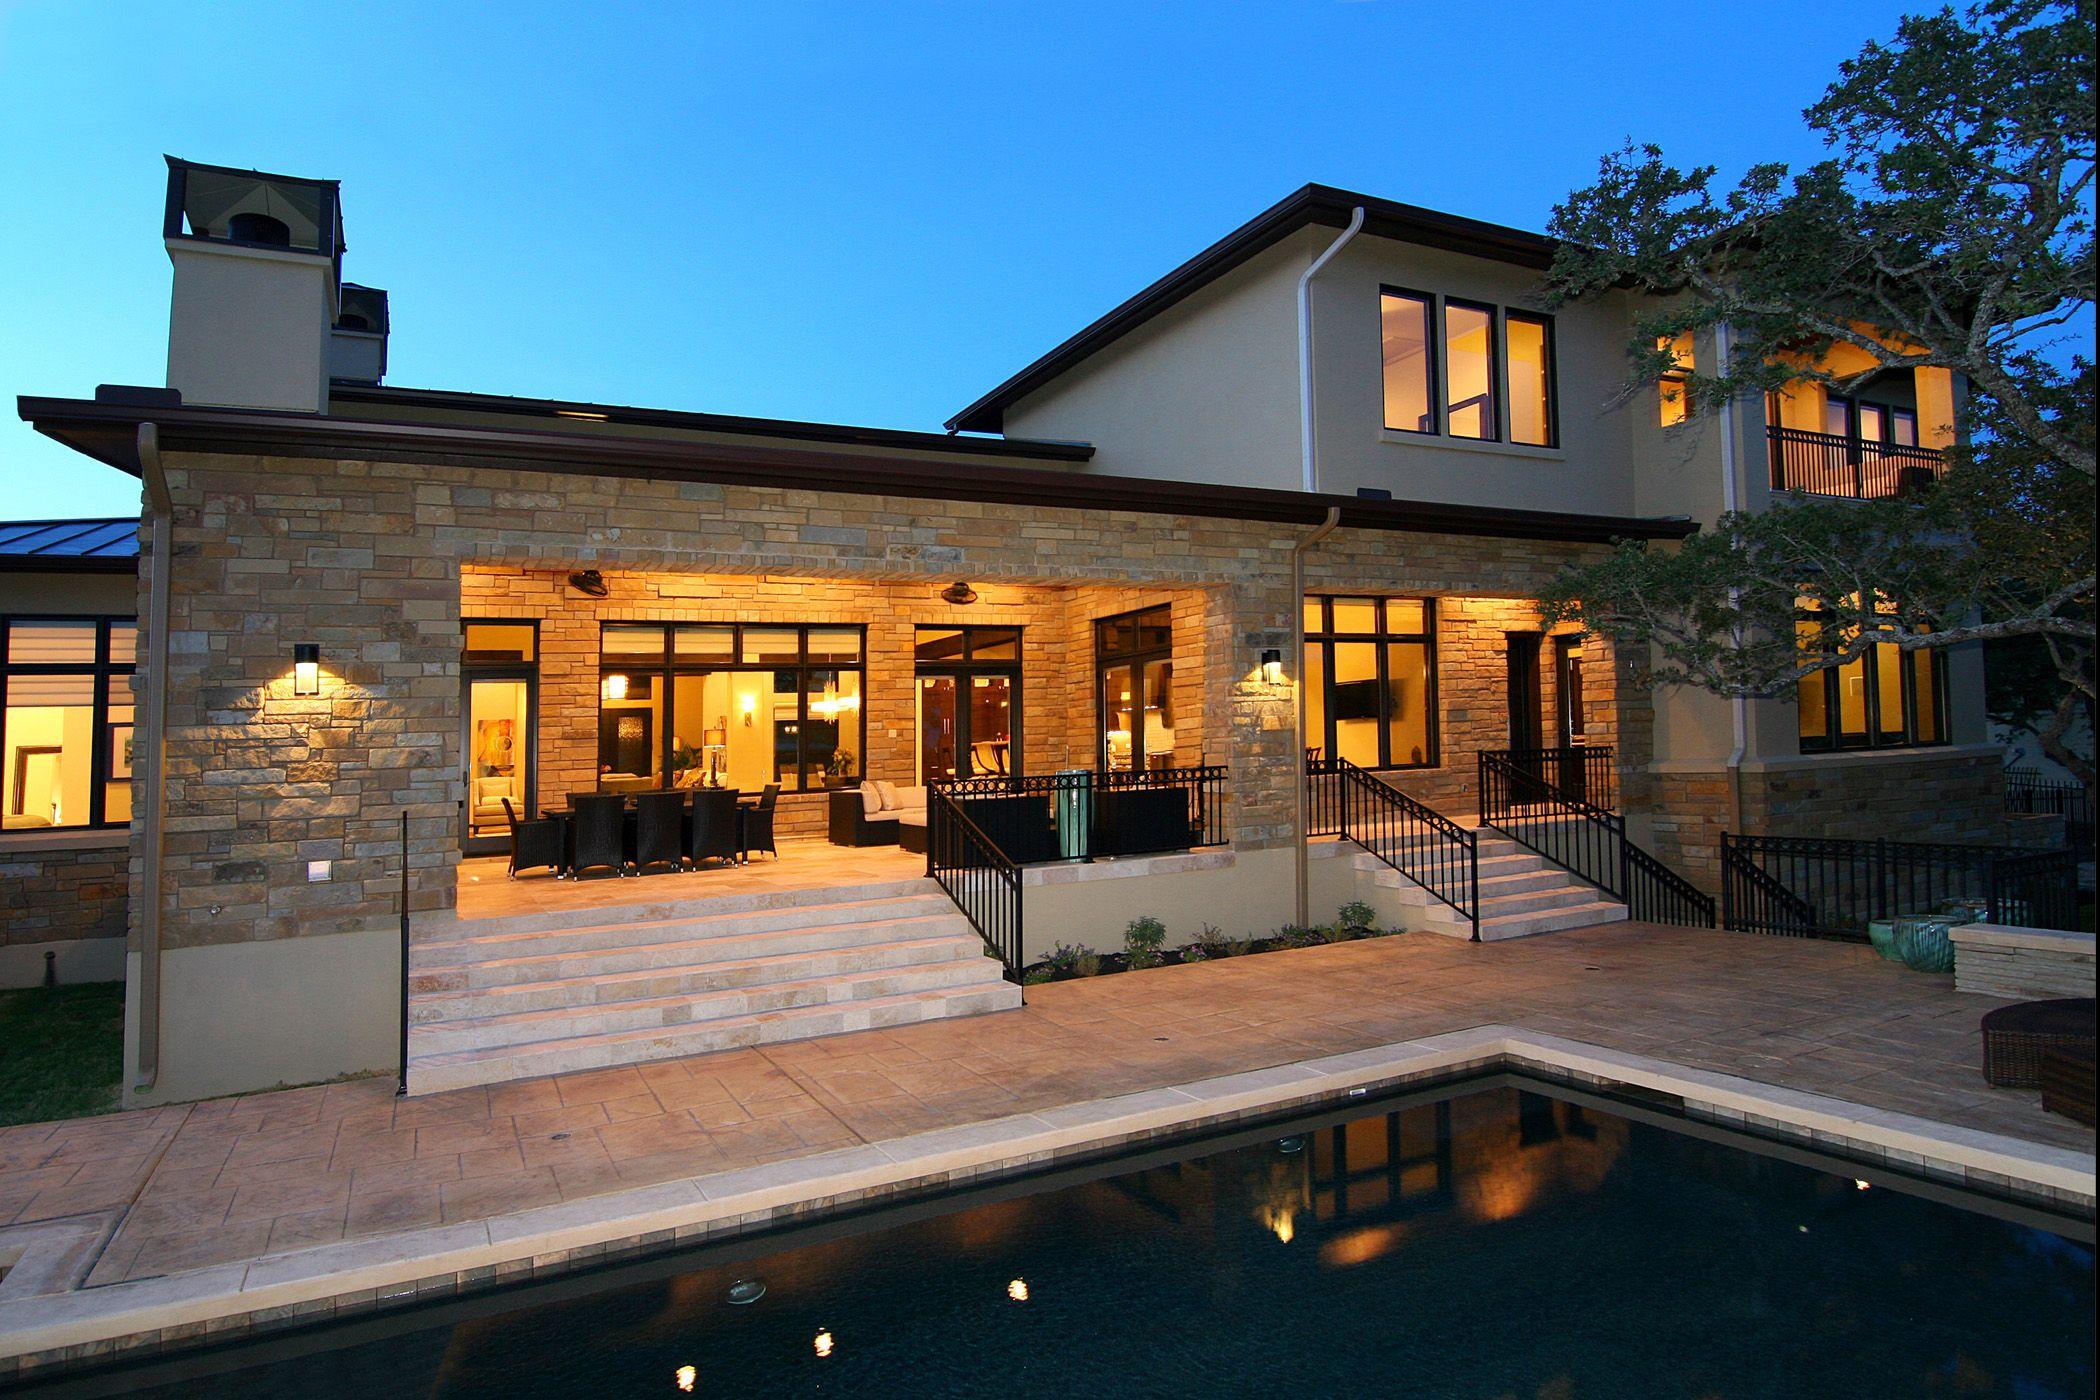 texas hill country homes exteriors | Austin Exterior Home ...